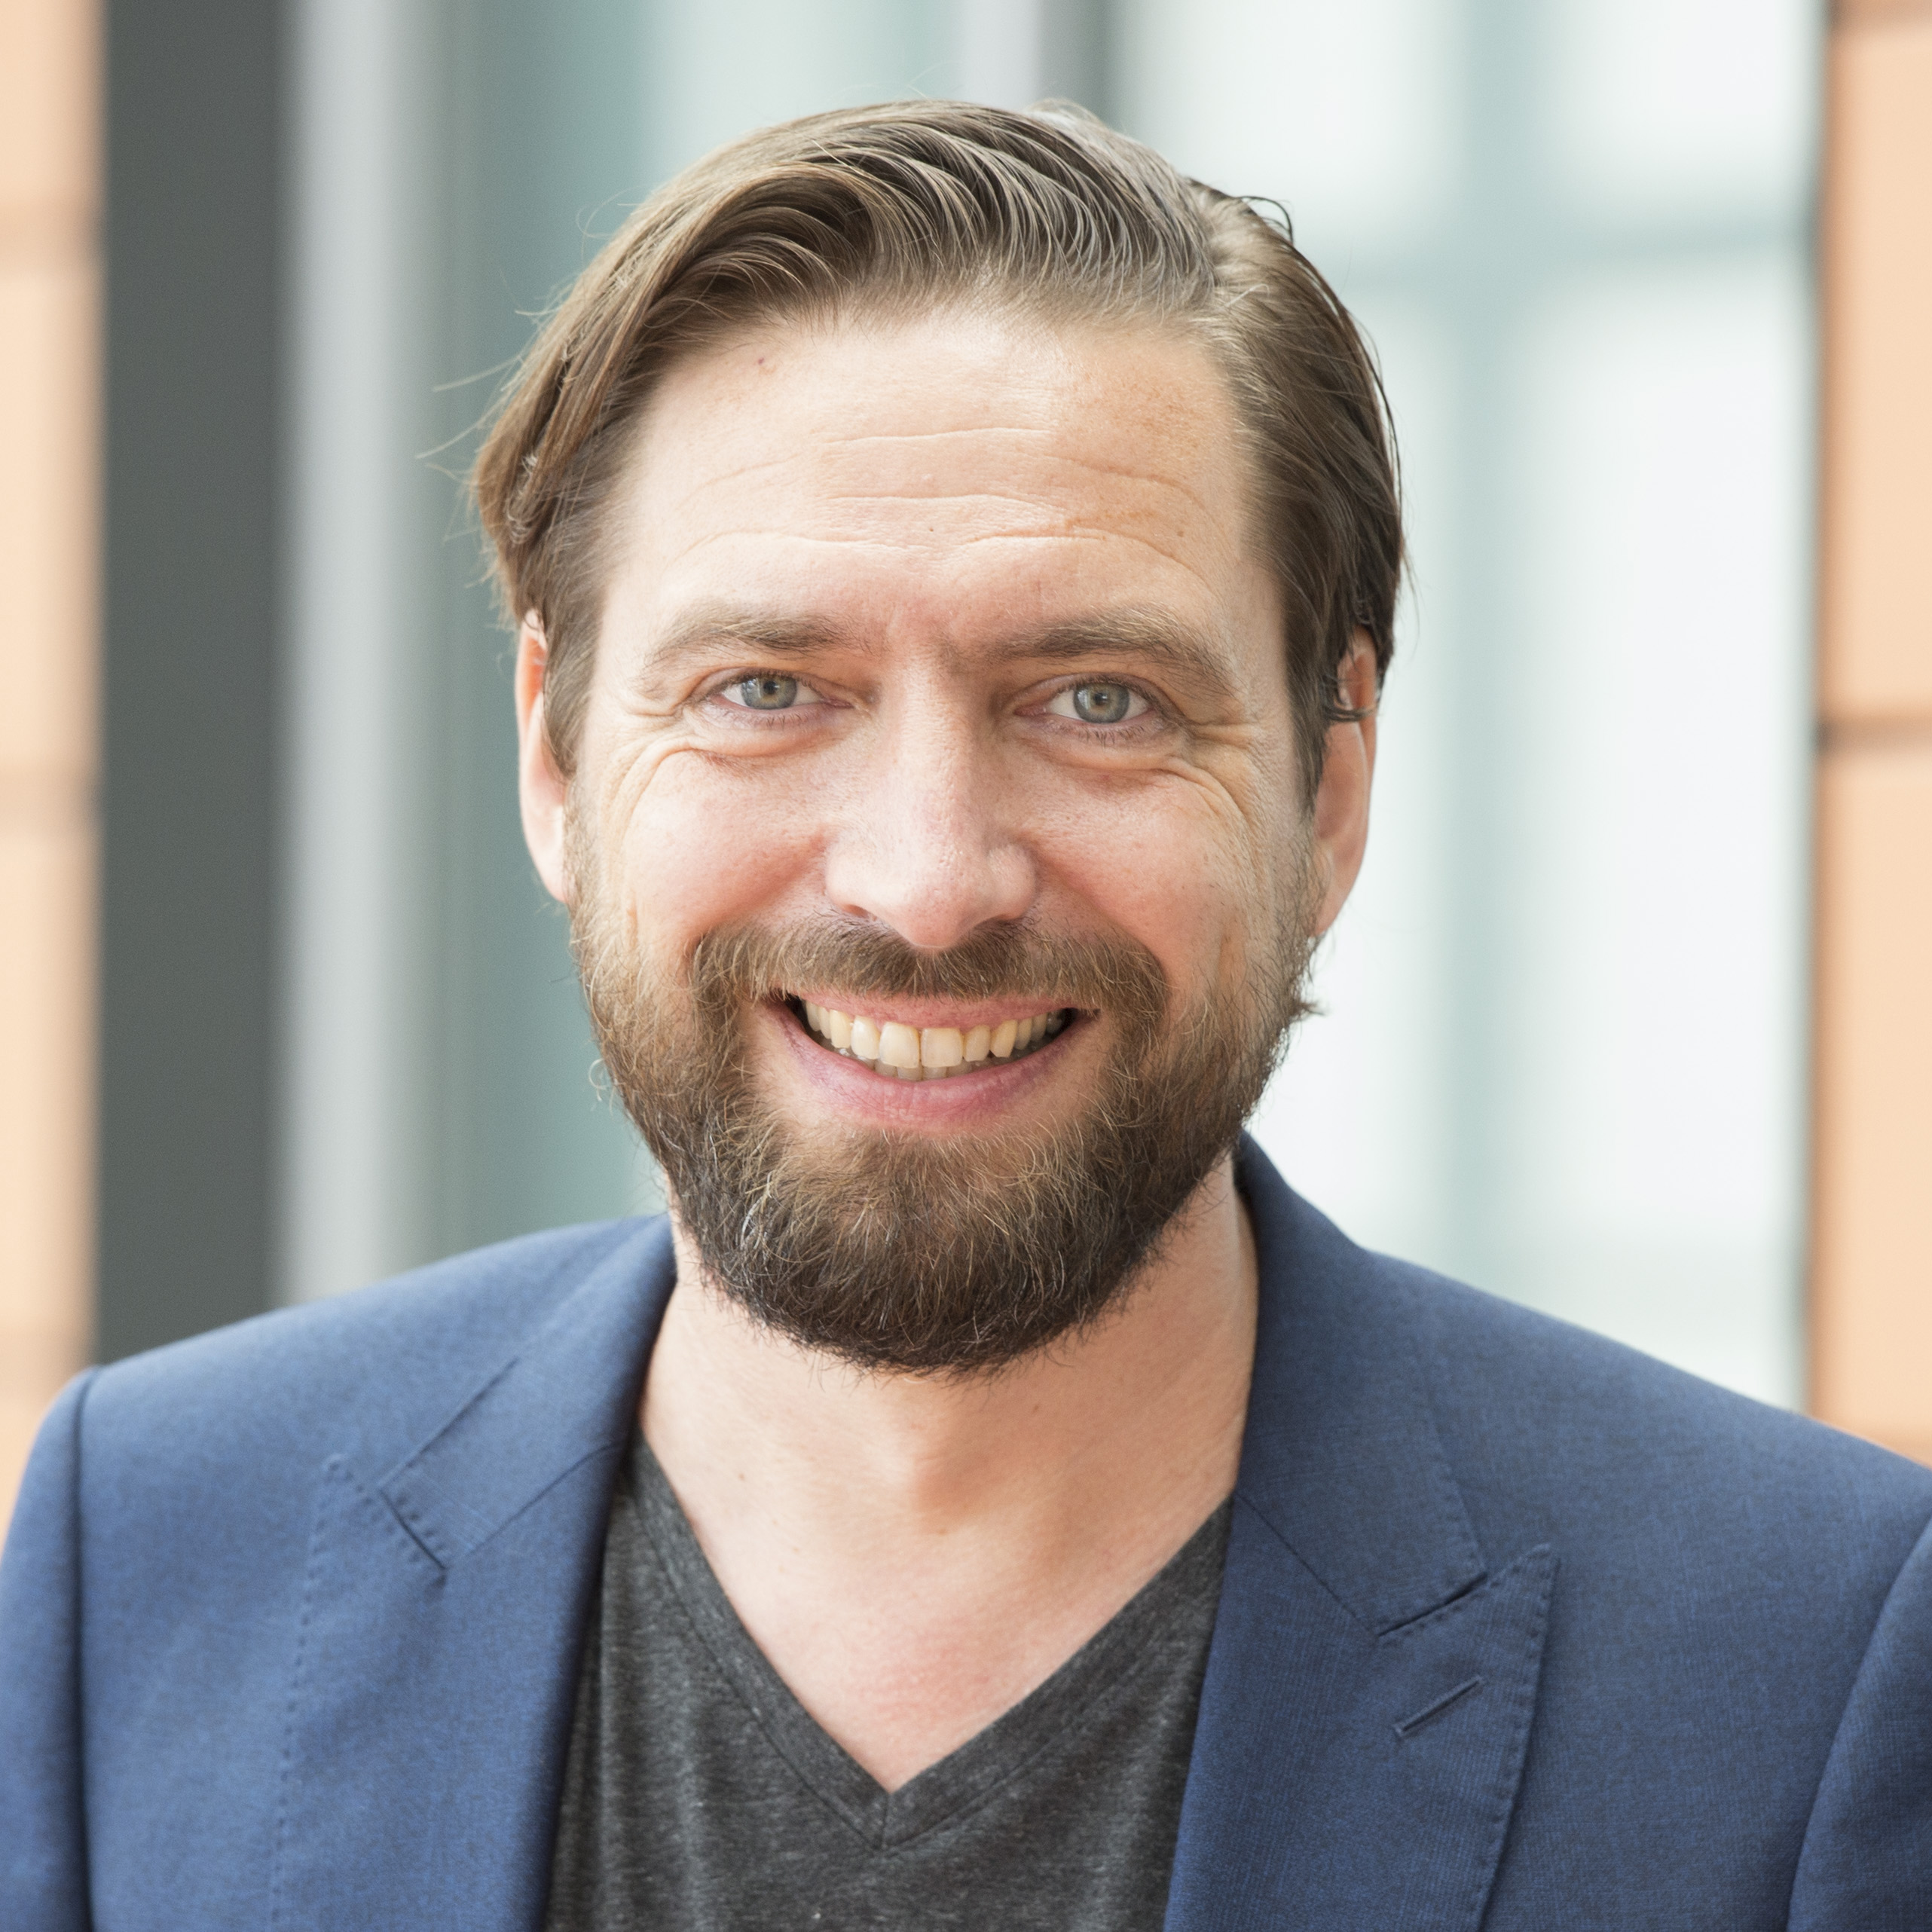 Klaus Wölfling, PhD